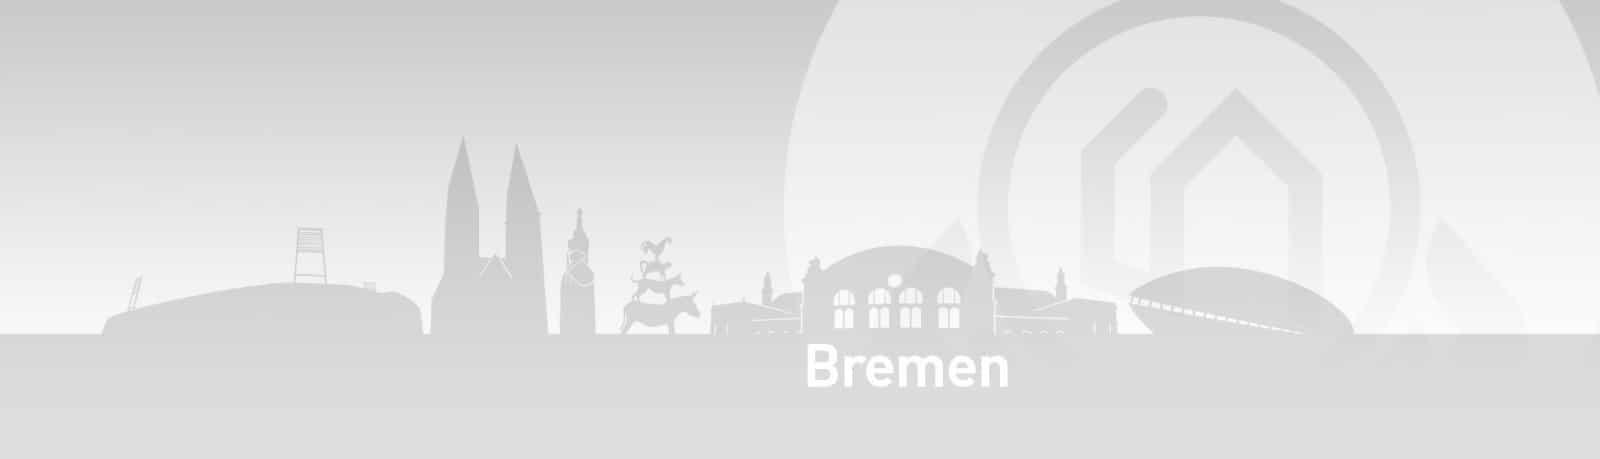 Bremen SENCURINA - Kalender Bremen